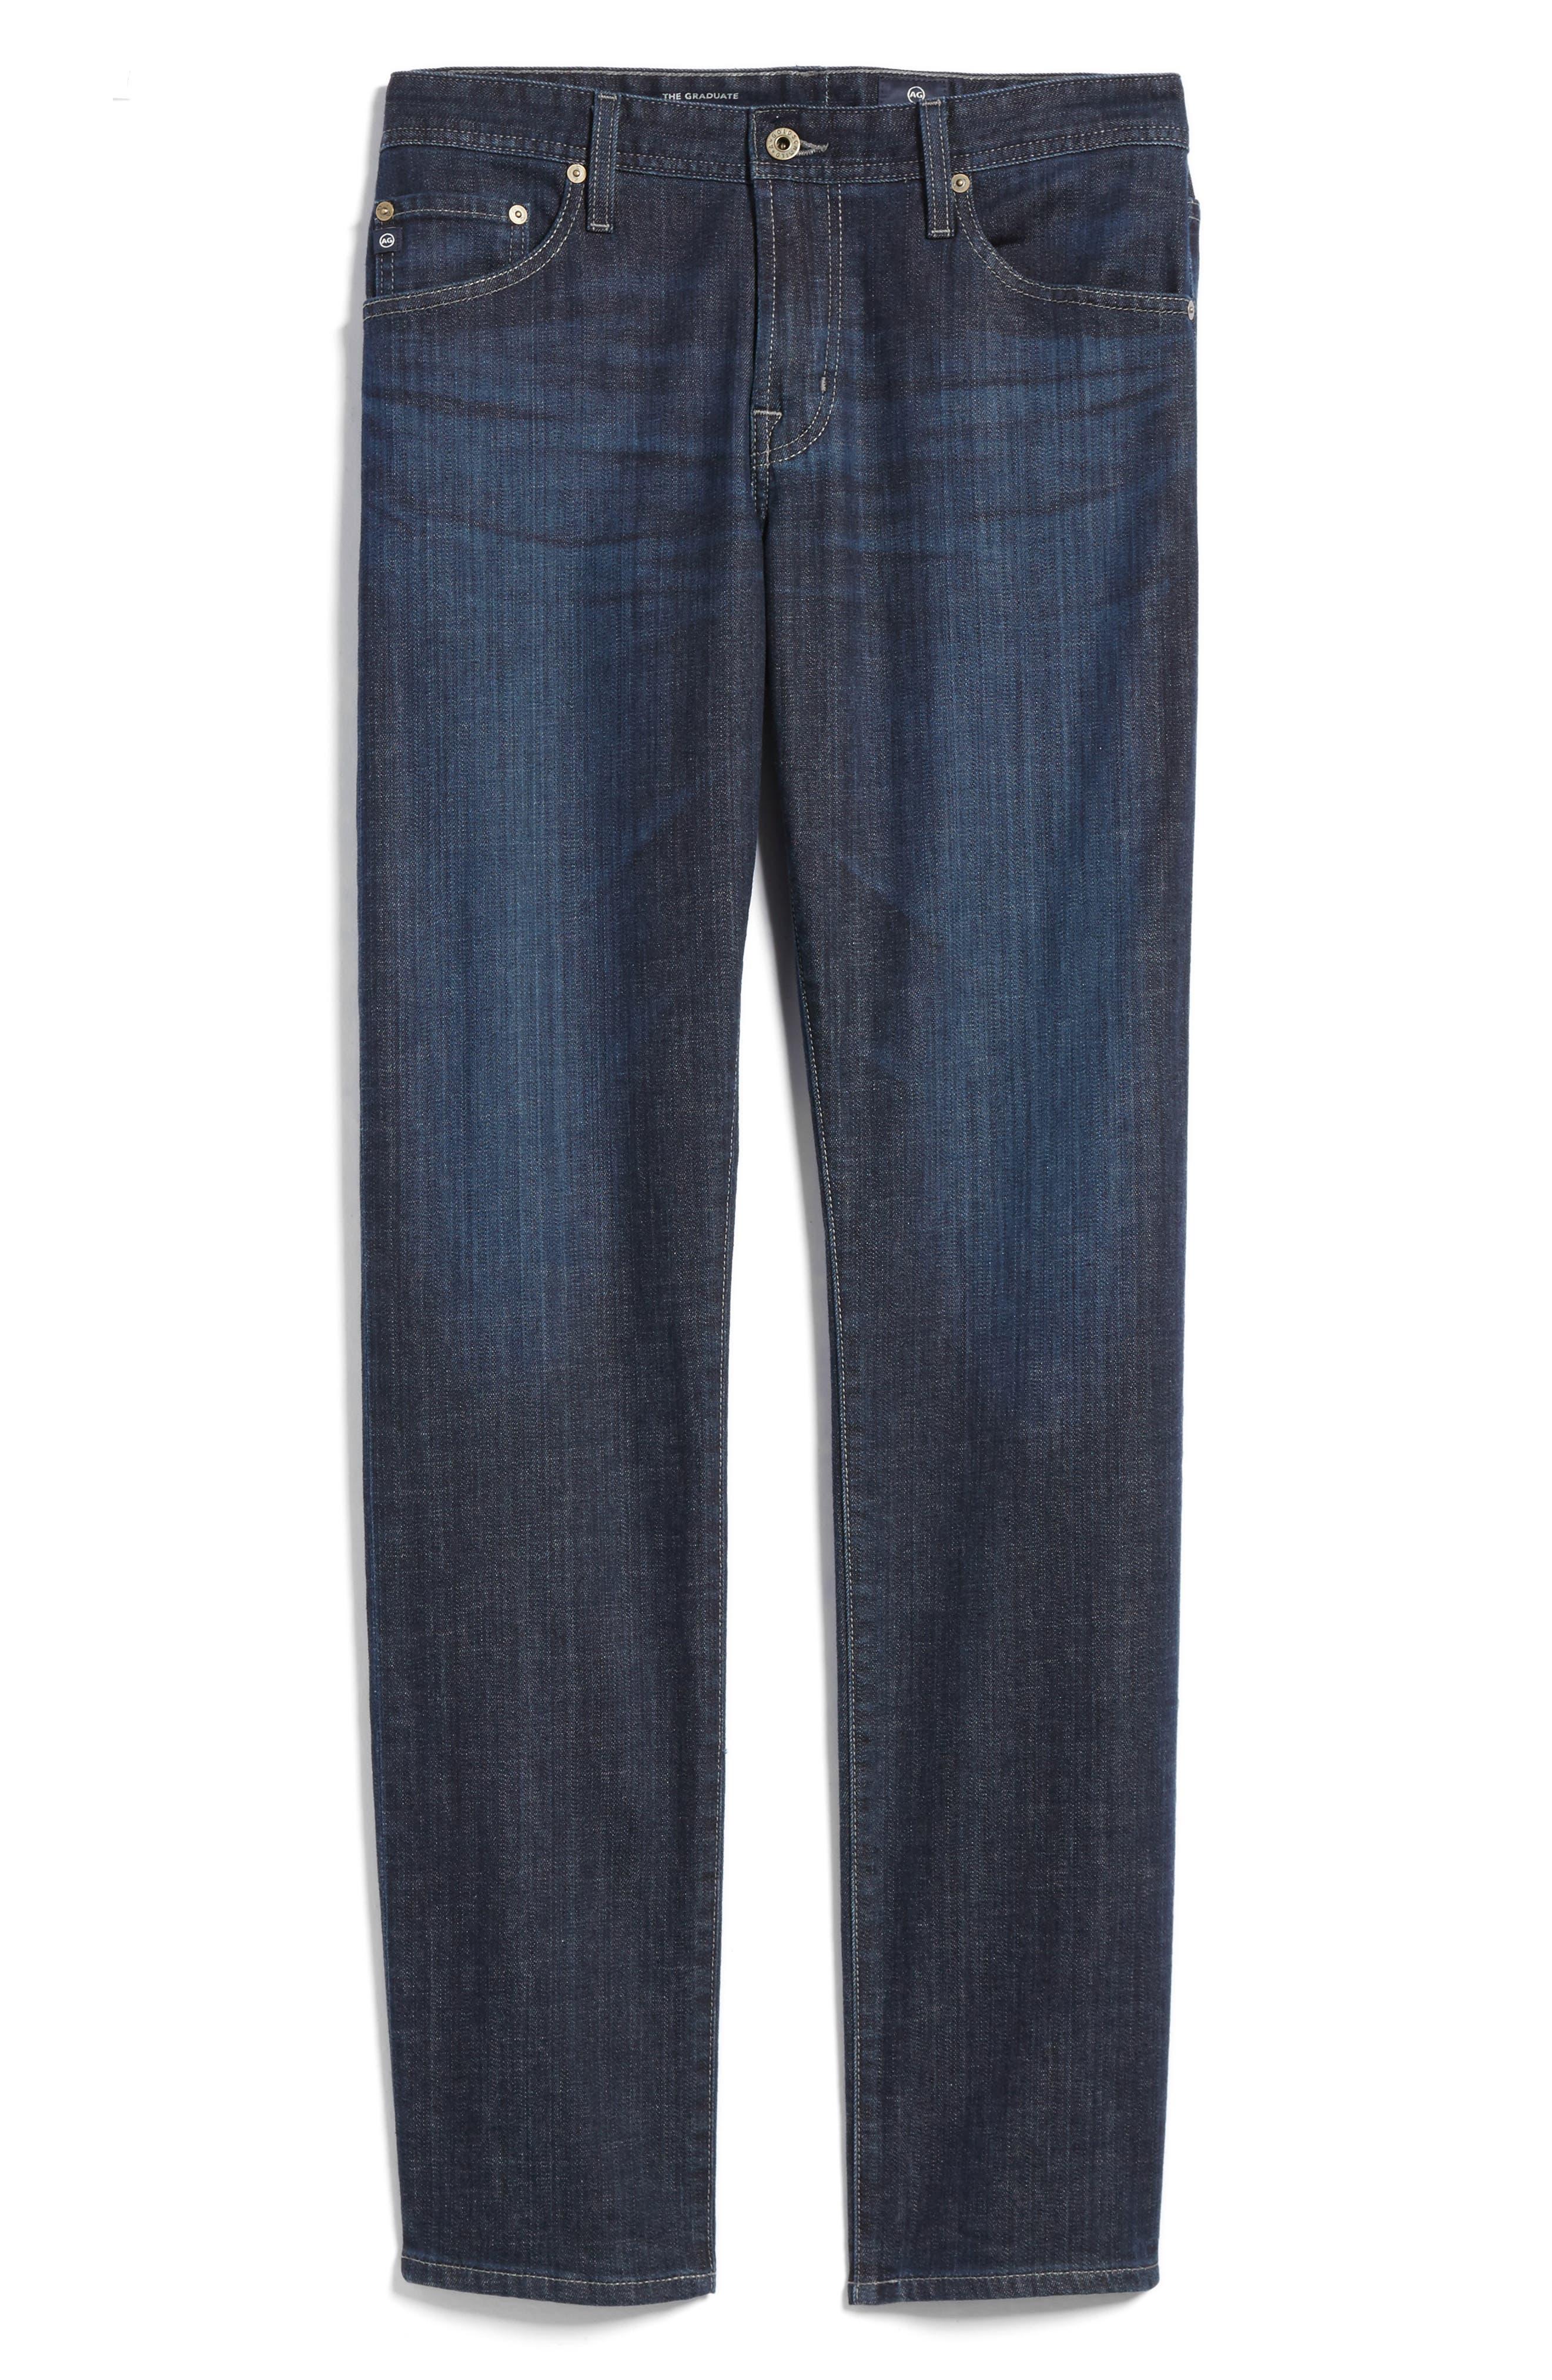 Graduate Slim Straight Leg Jeans,                             Alternate thumbnail 6, color,                             472